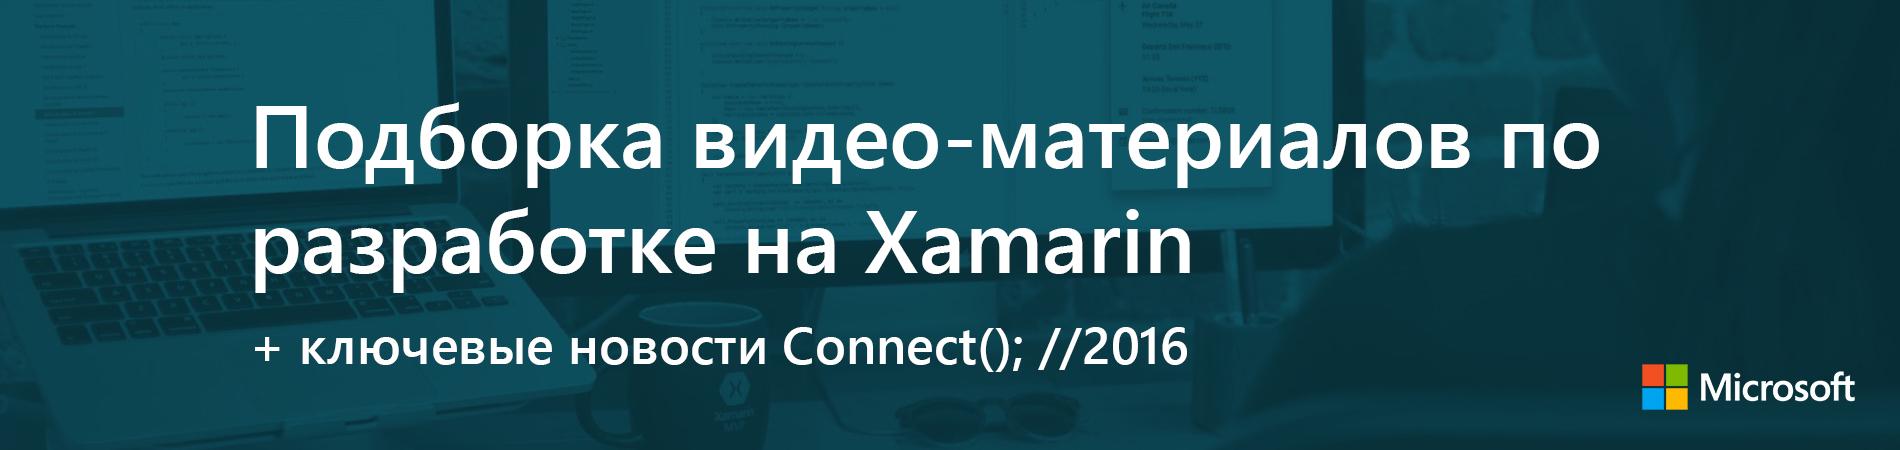 видео-материалов по разработке на Xamarin